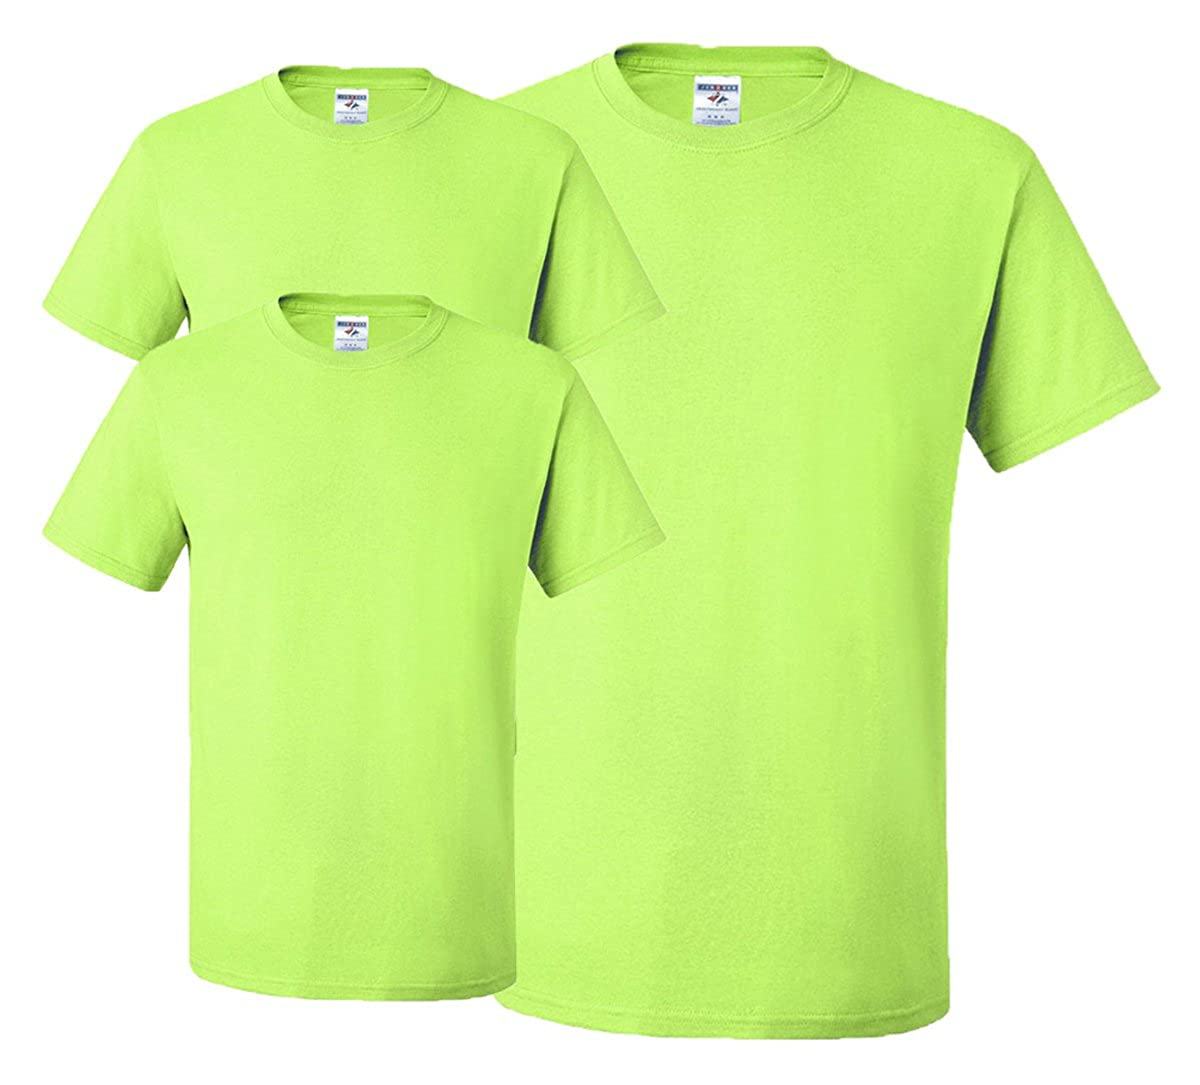 Jerzees メンズ 大人用 半袖Tシャツ(3枚組) B01CZYJVYO グリーン(Safety Green) 3X Tall 3X Tall|グリーン(Safety Green)